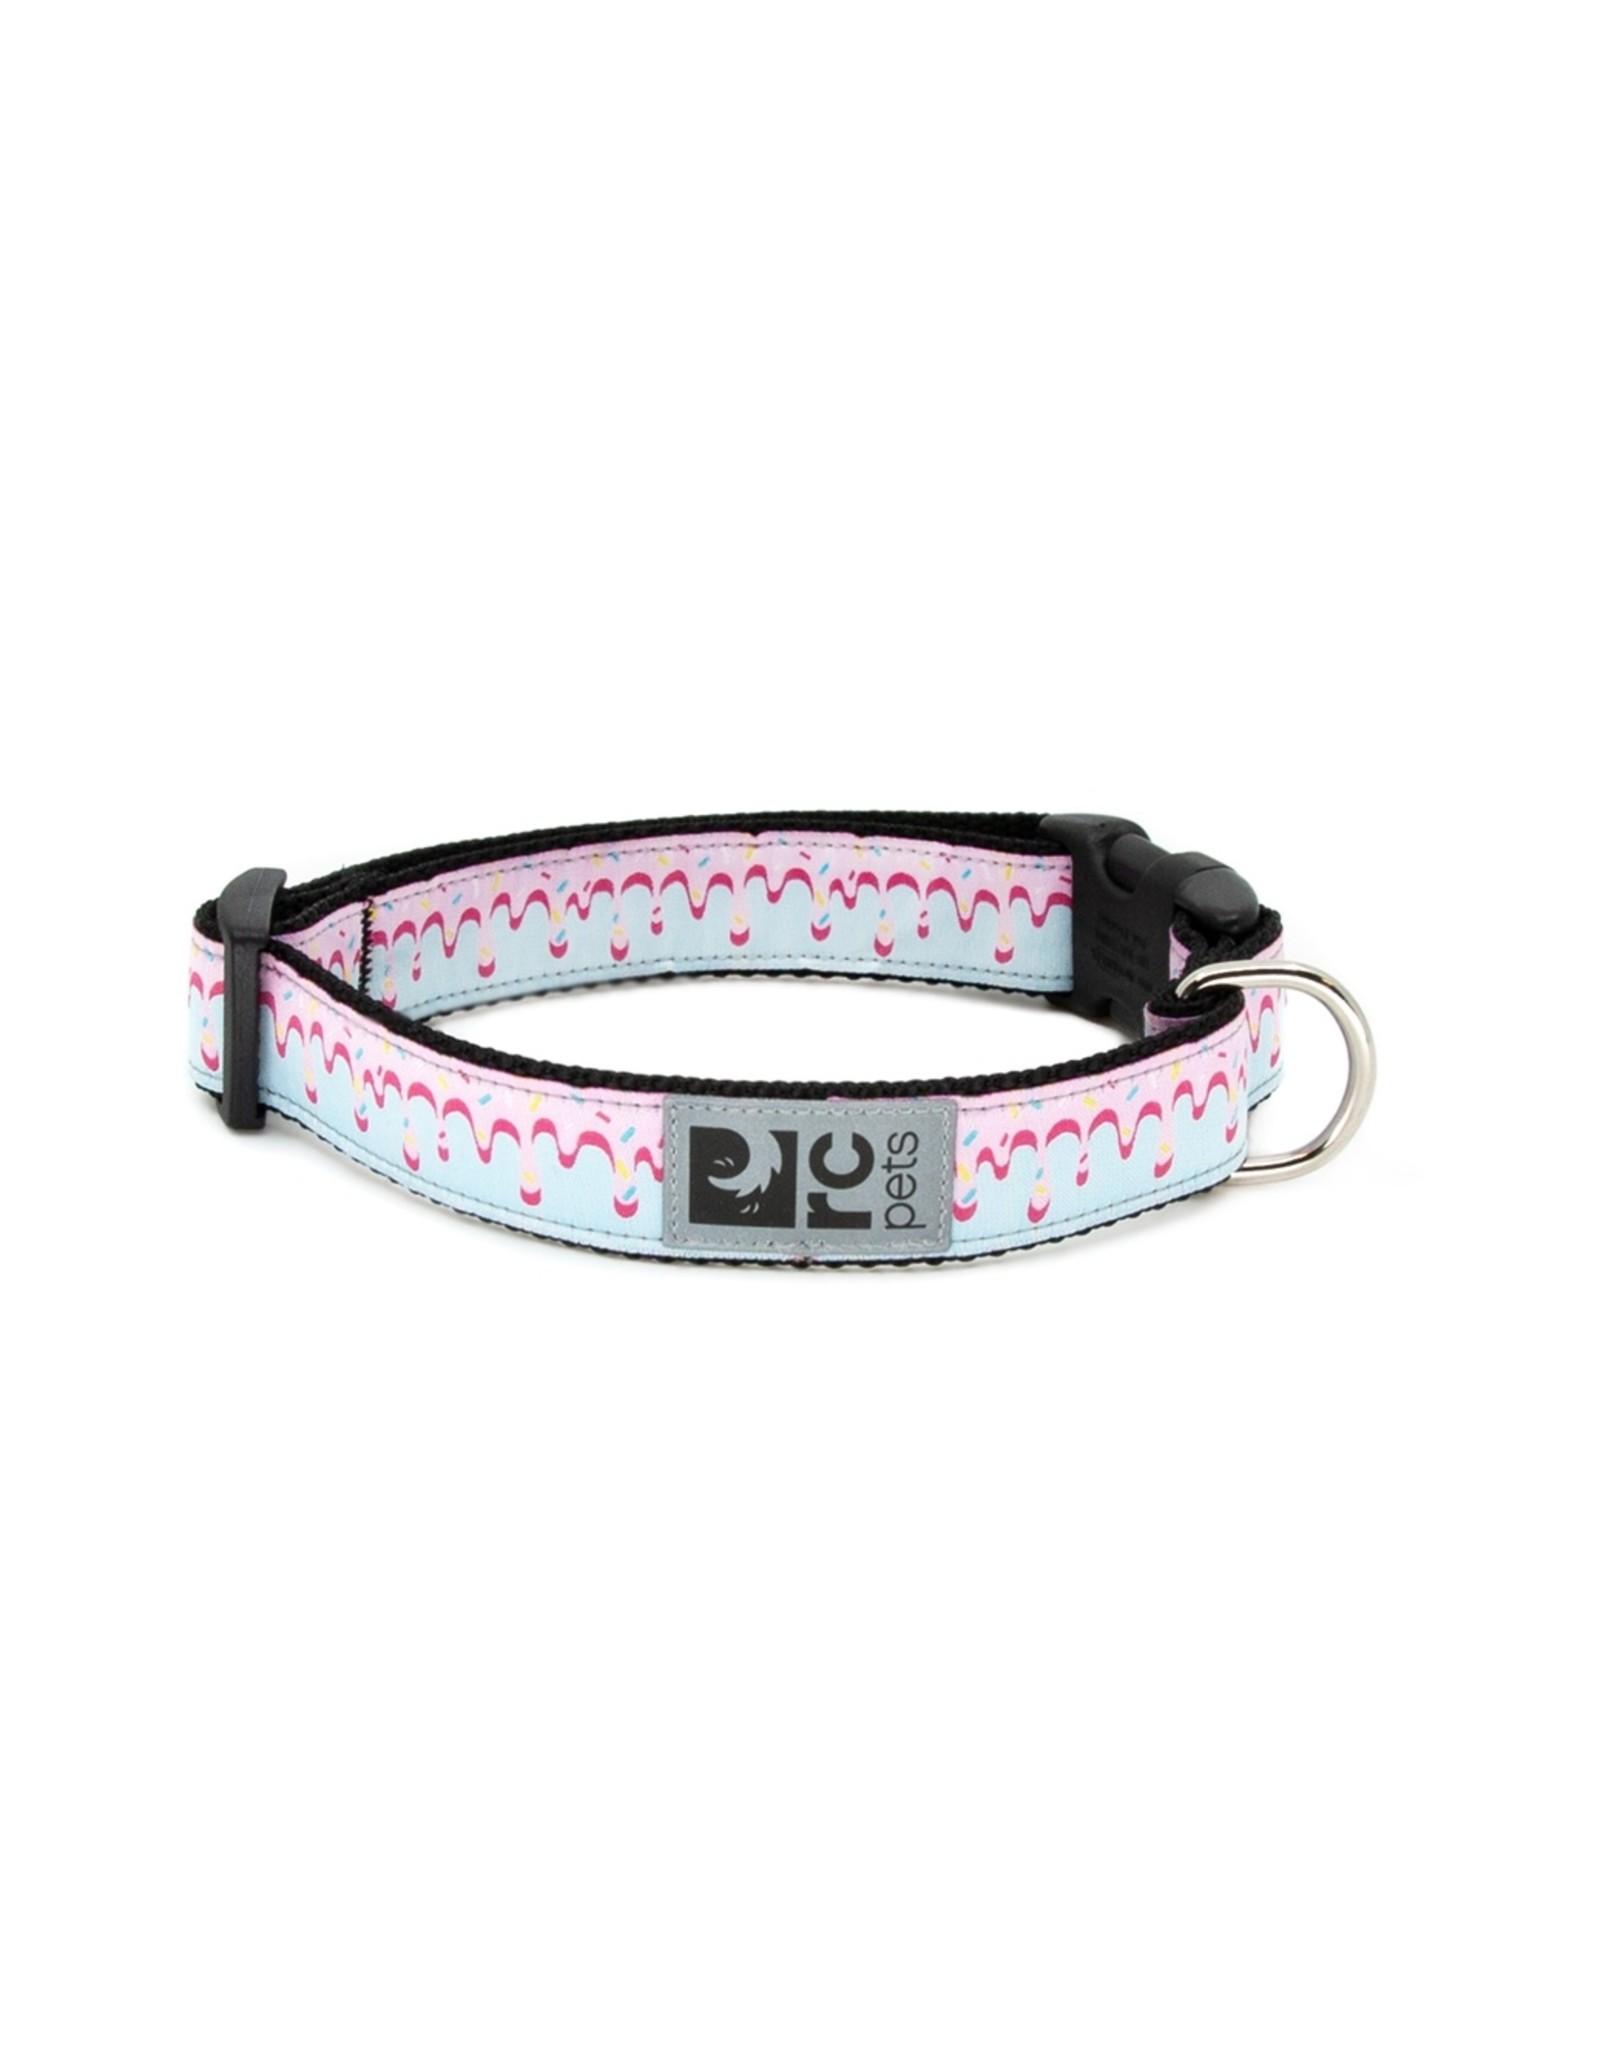 RC Pets Clip Collar - Icing